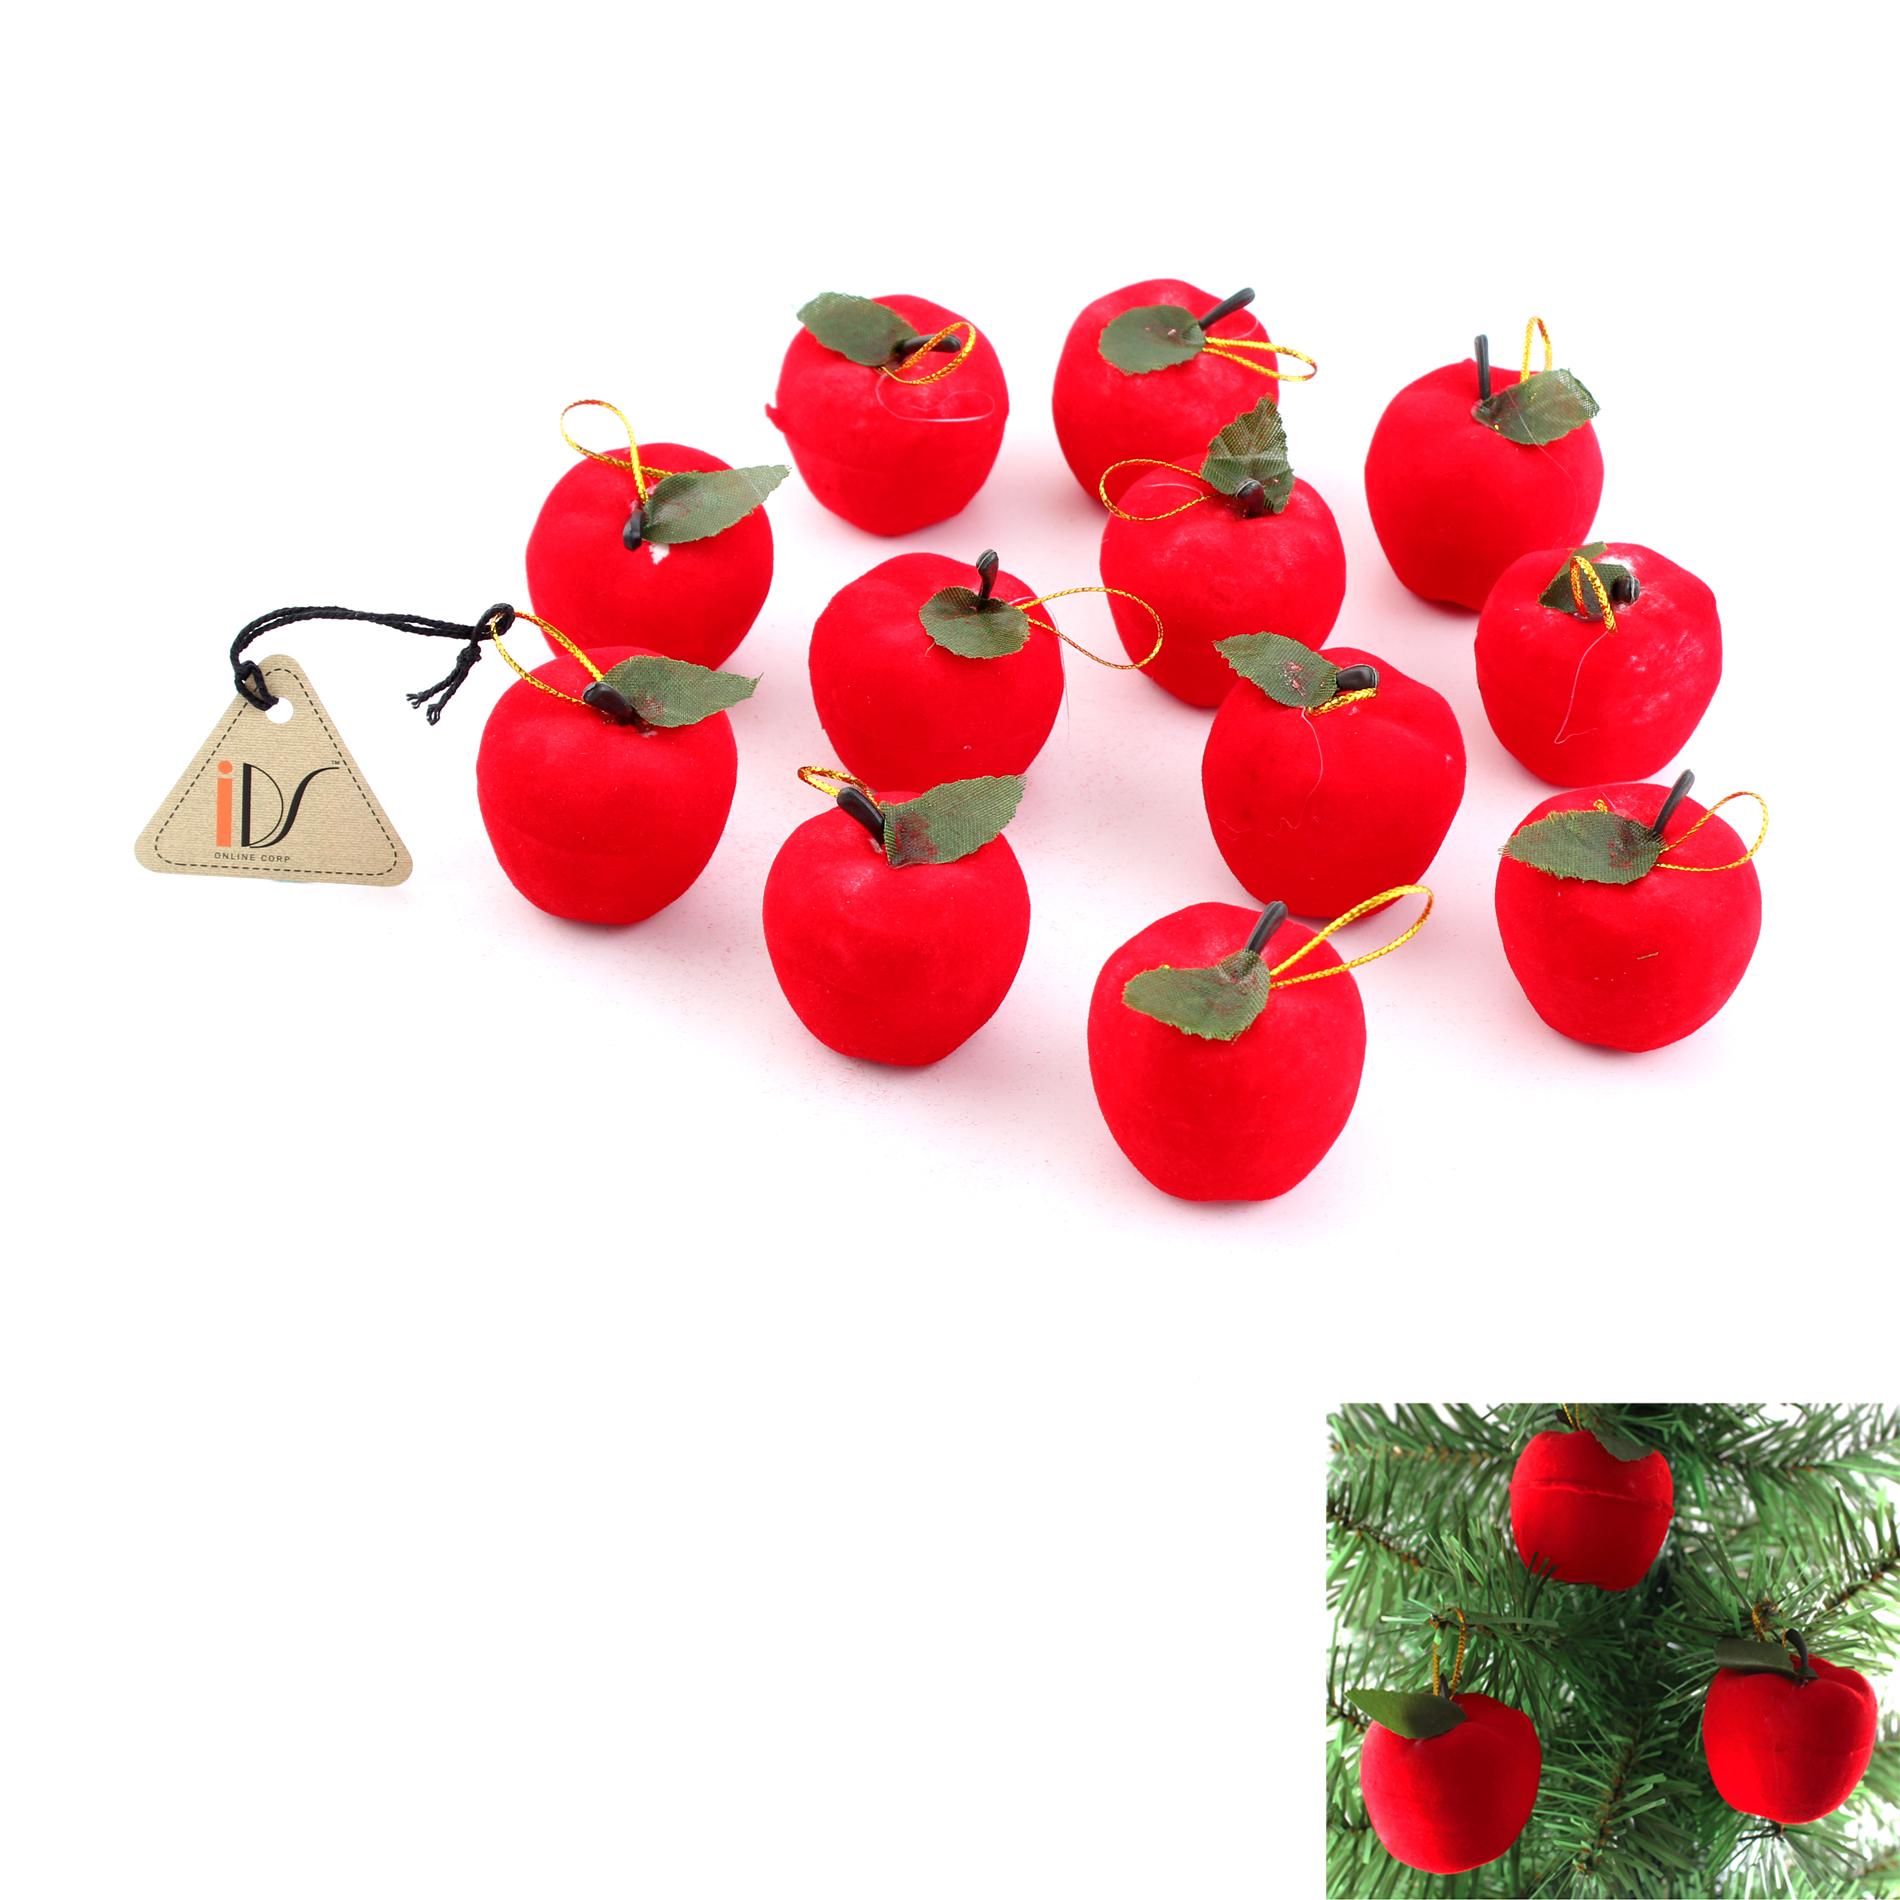 12 pcs Christmas red apples christmas tree ornament hanging XMAS party decor